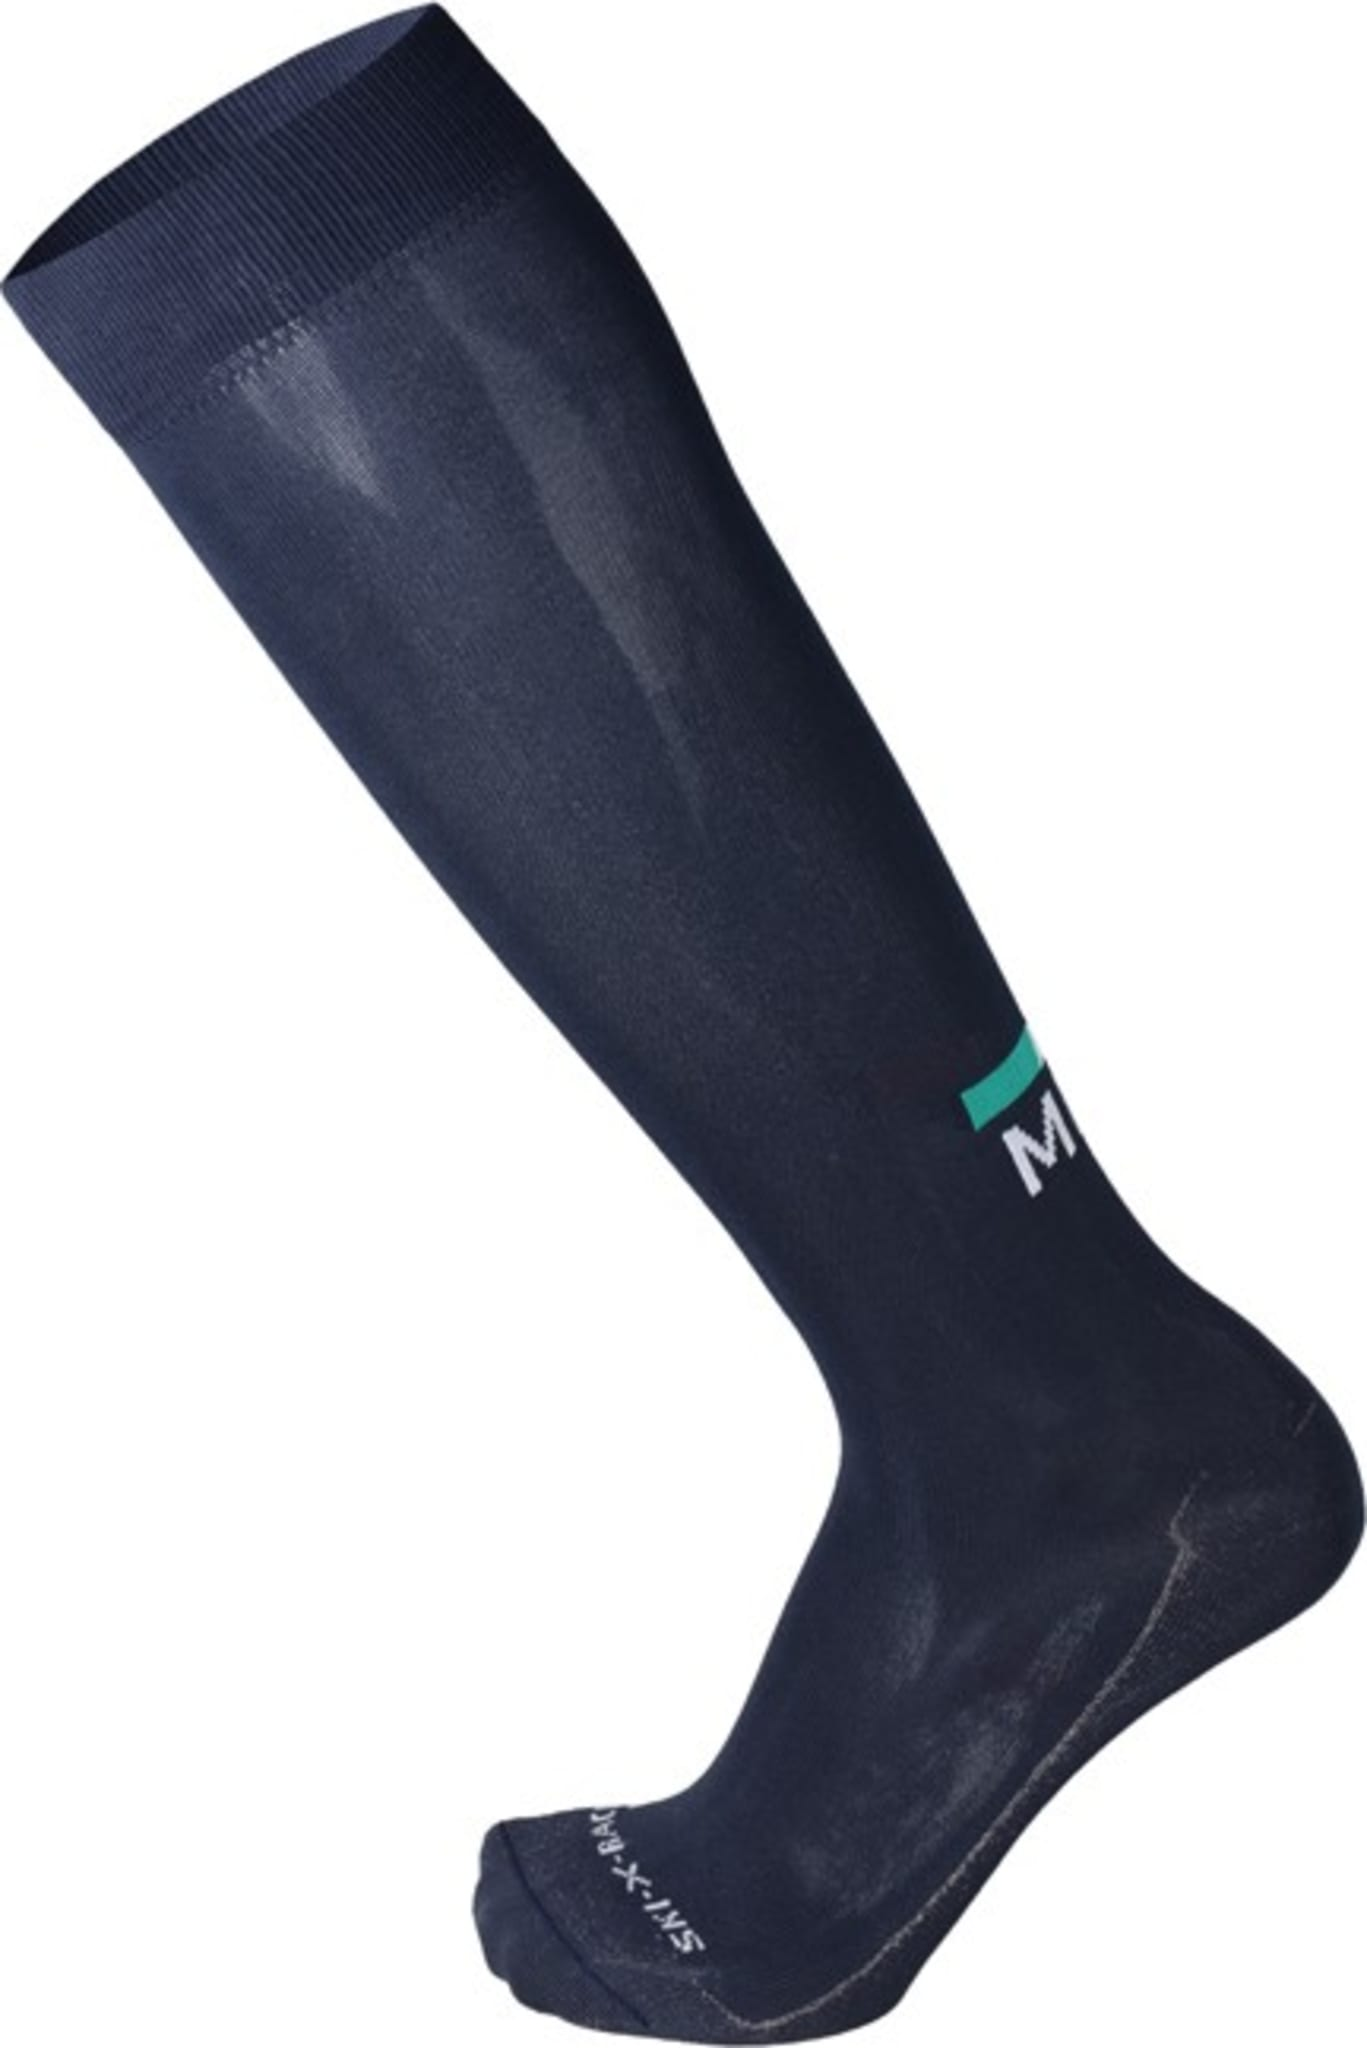 Mico X-Race ski sock